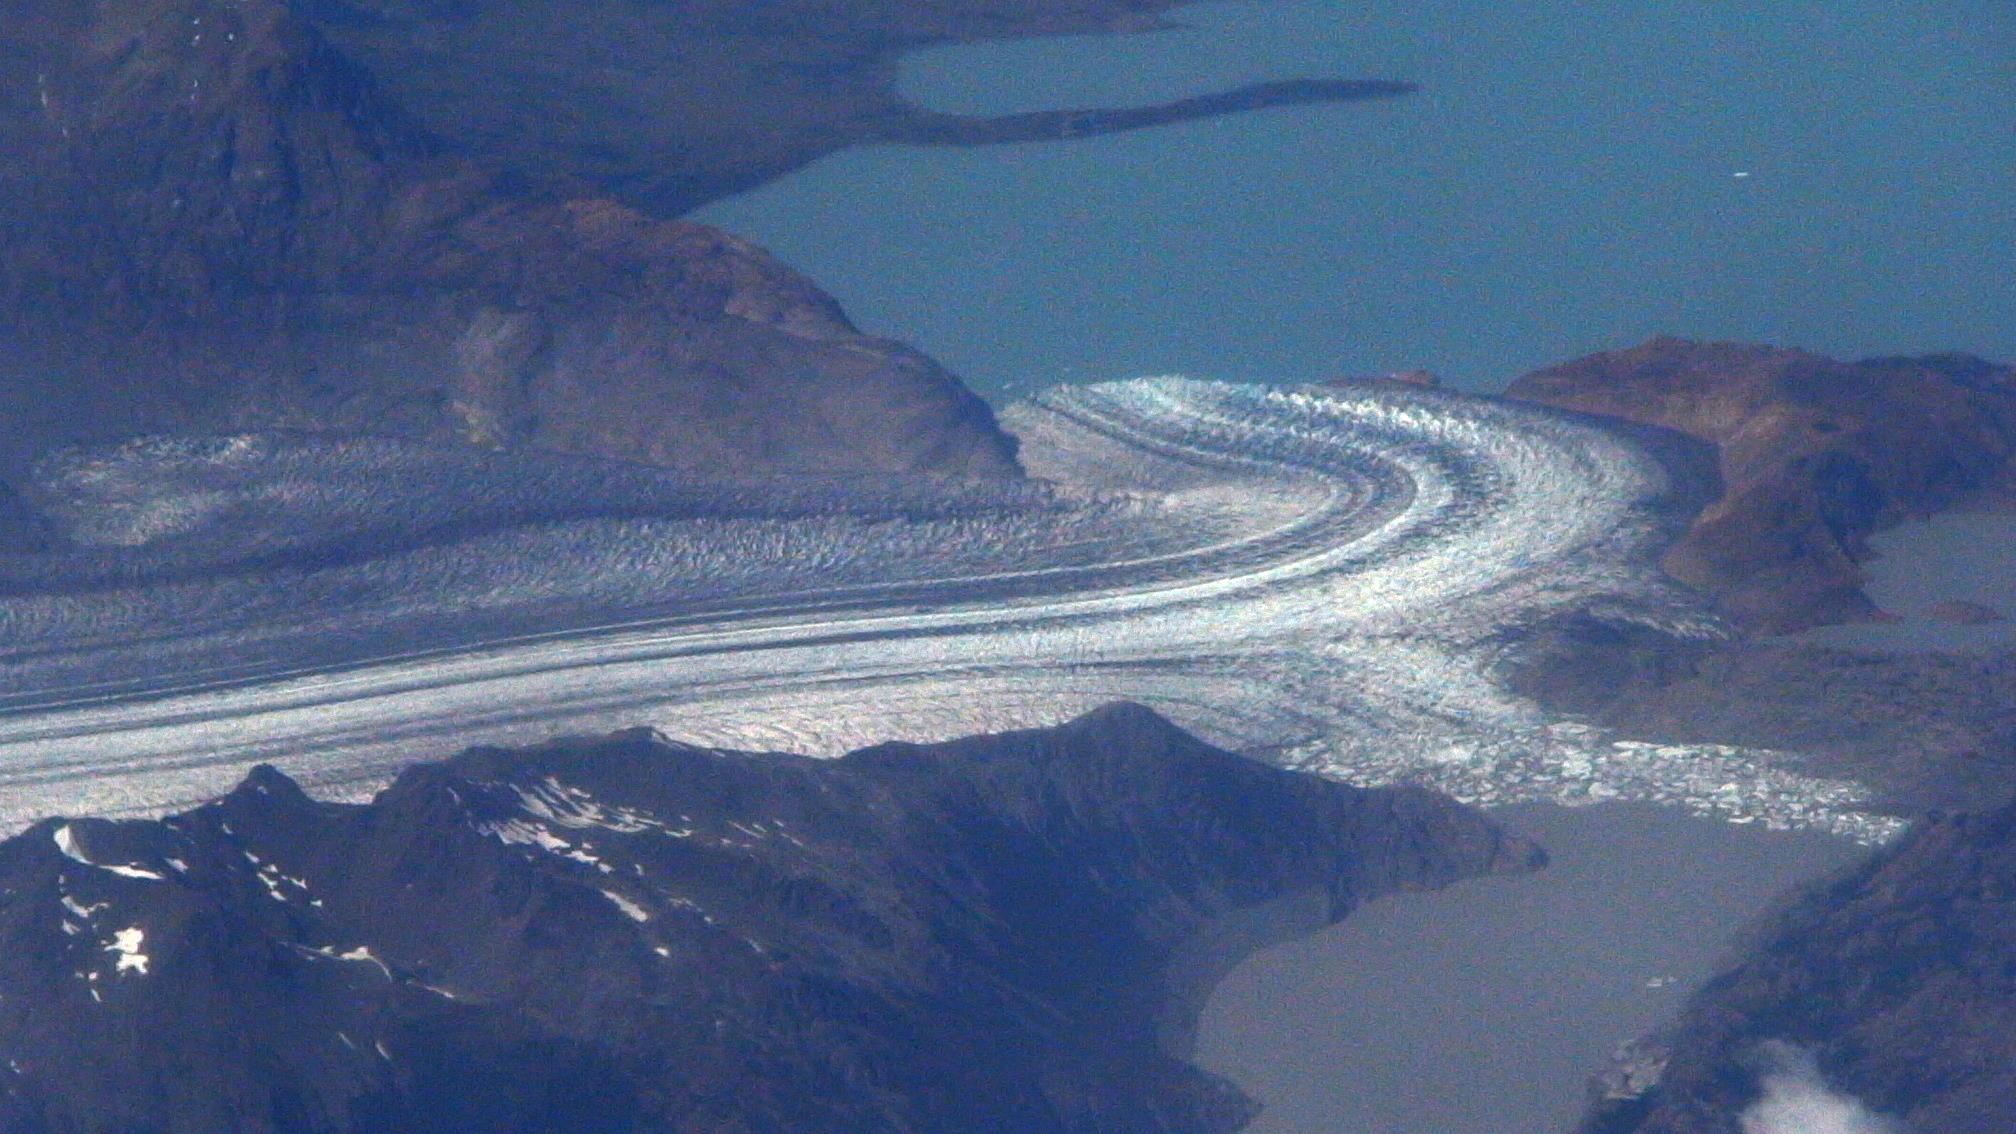 Glaciar Viedma Wikiwand